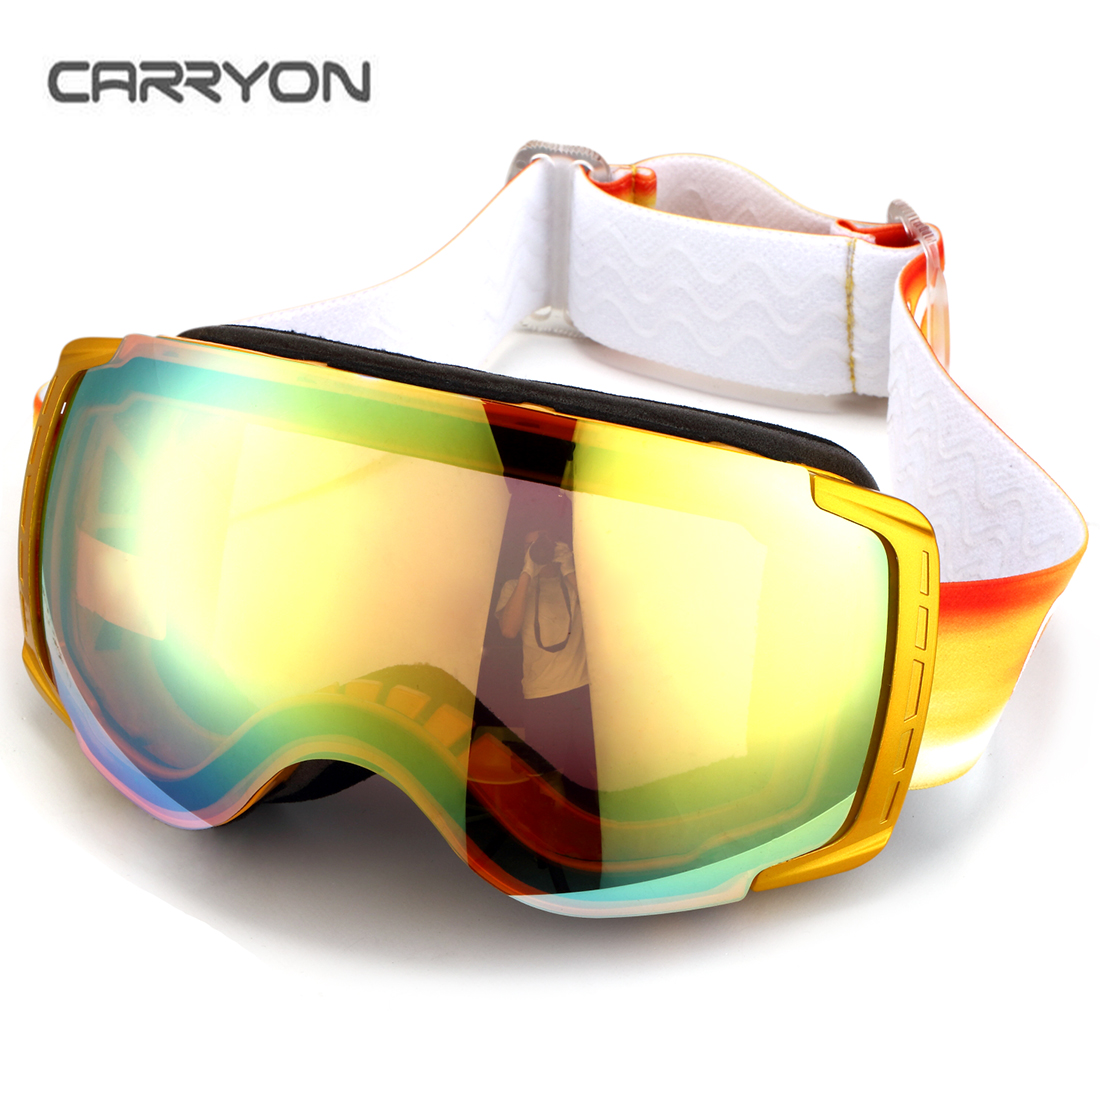 Carryon Authorized Snowboard Ski Goggles Anti-fog UV Protect OTG Over Glasses Skiing Snowmobile Gold